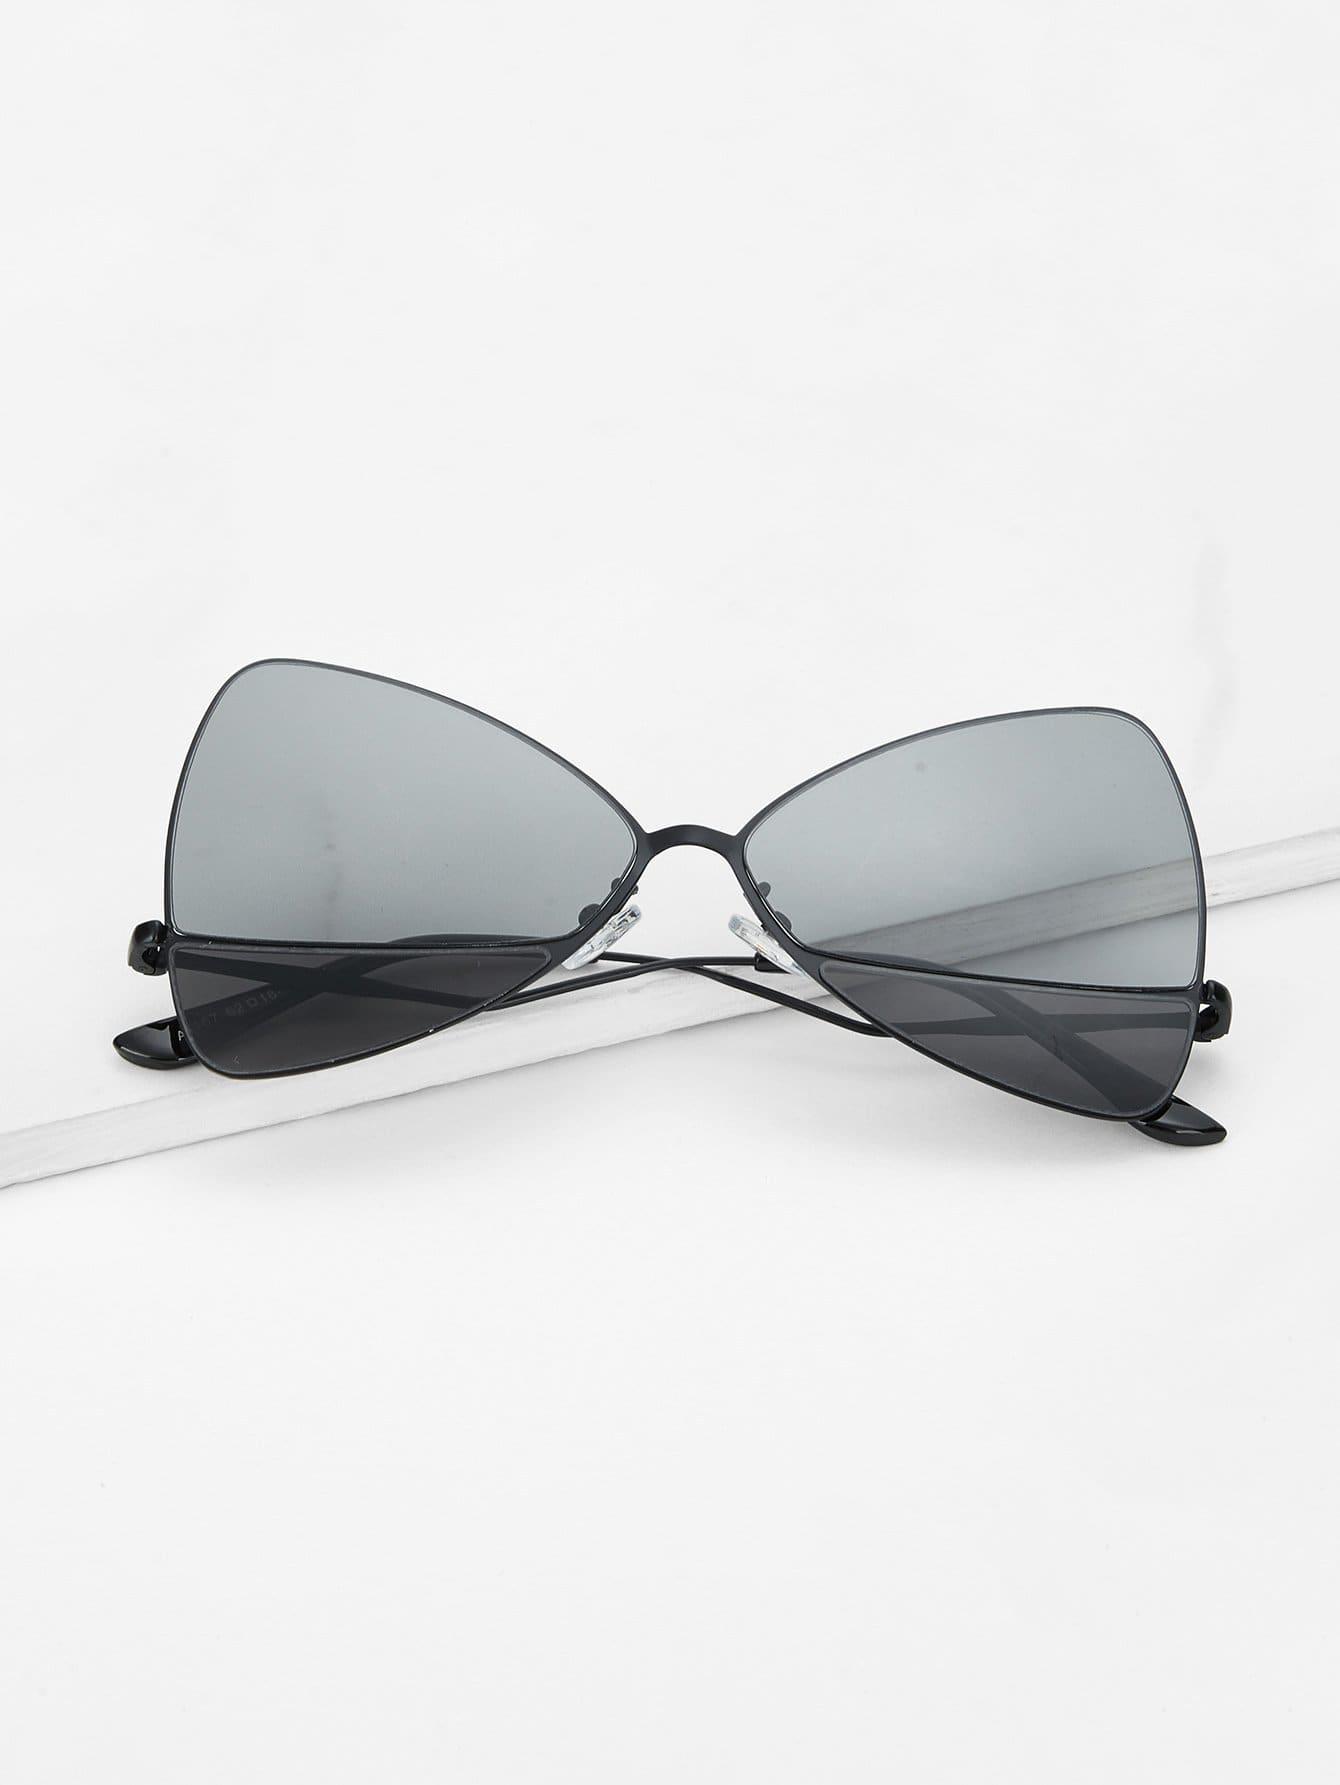 Triangle Shaped Lens Sunglasses triangle design mirror lens sunglasses